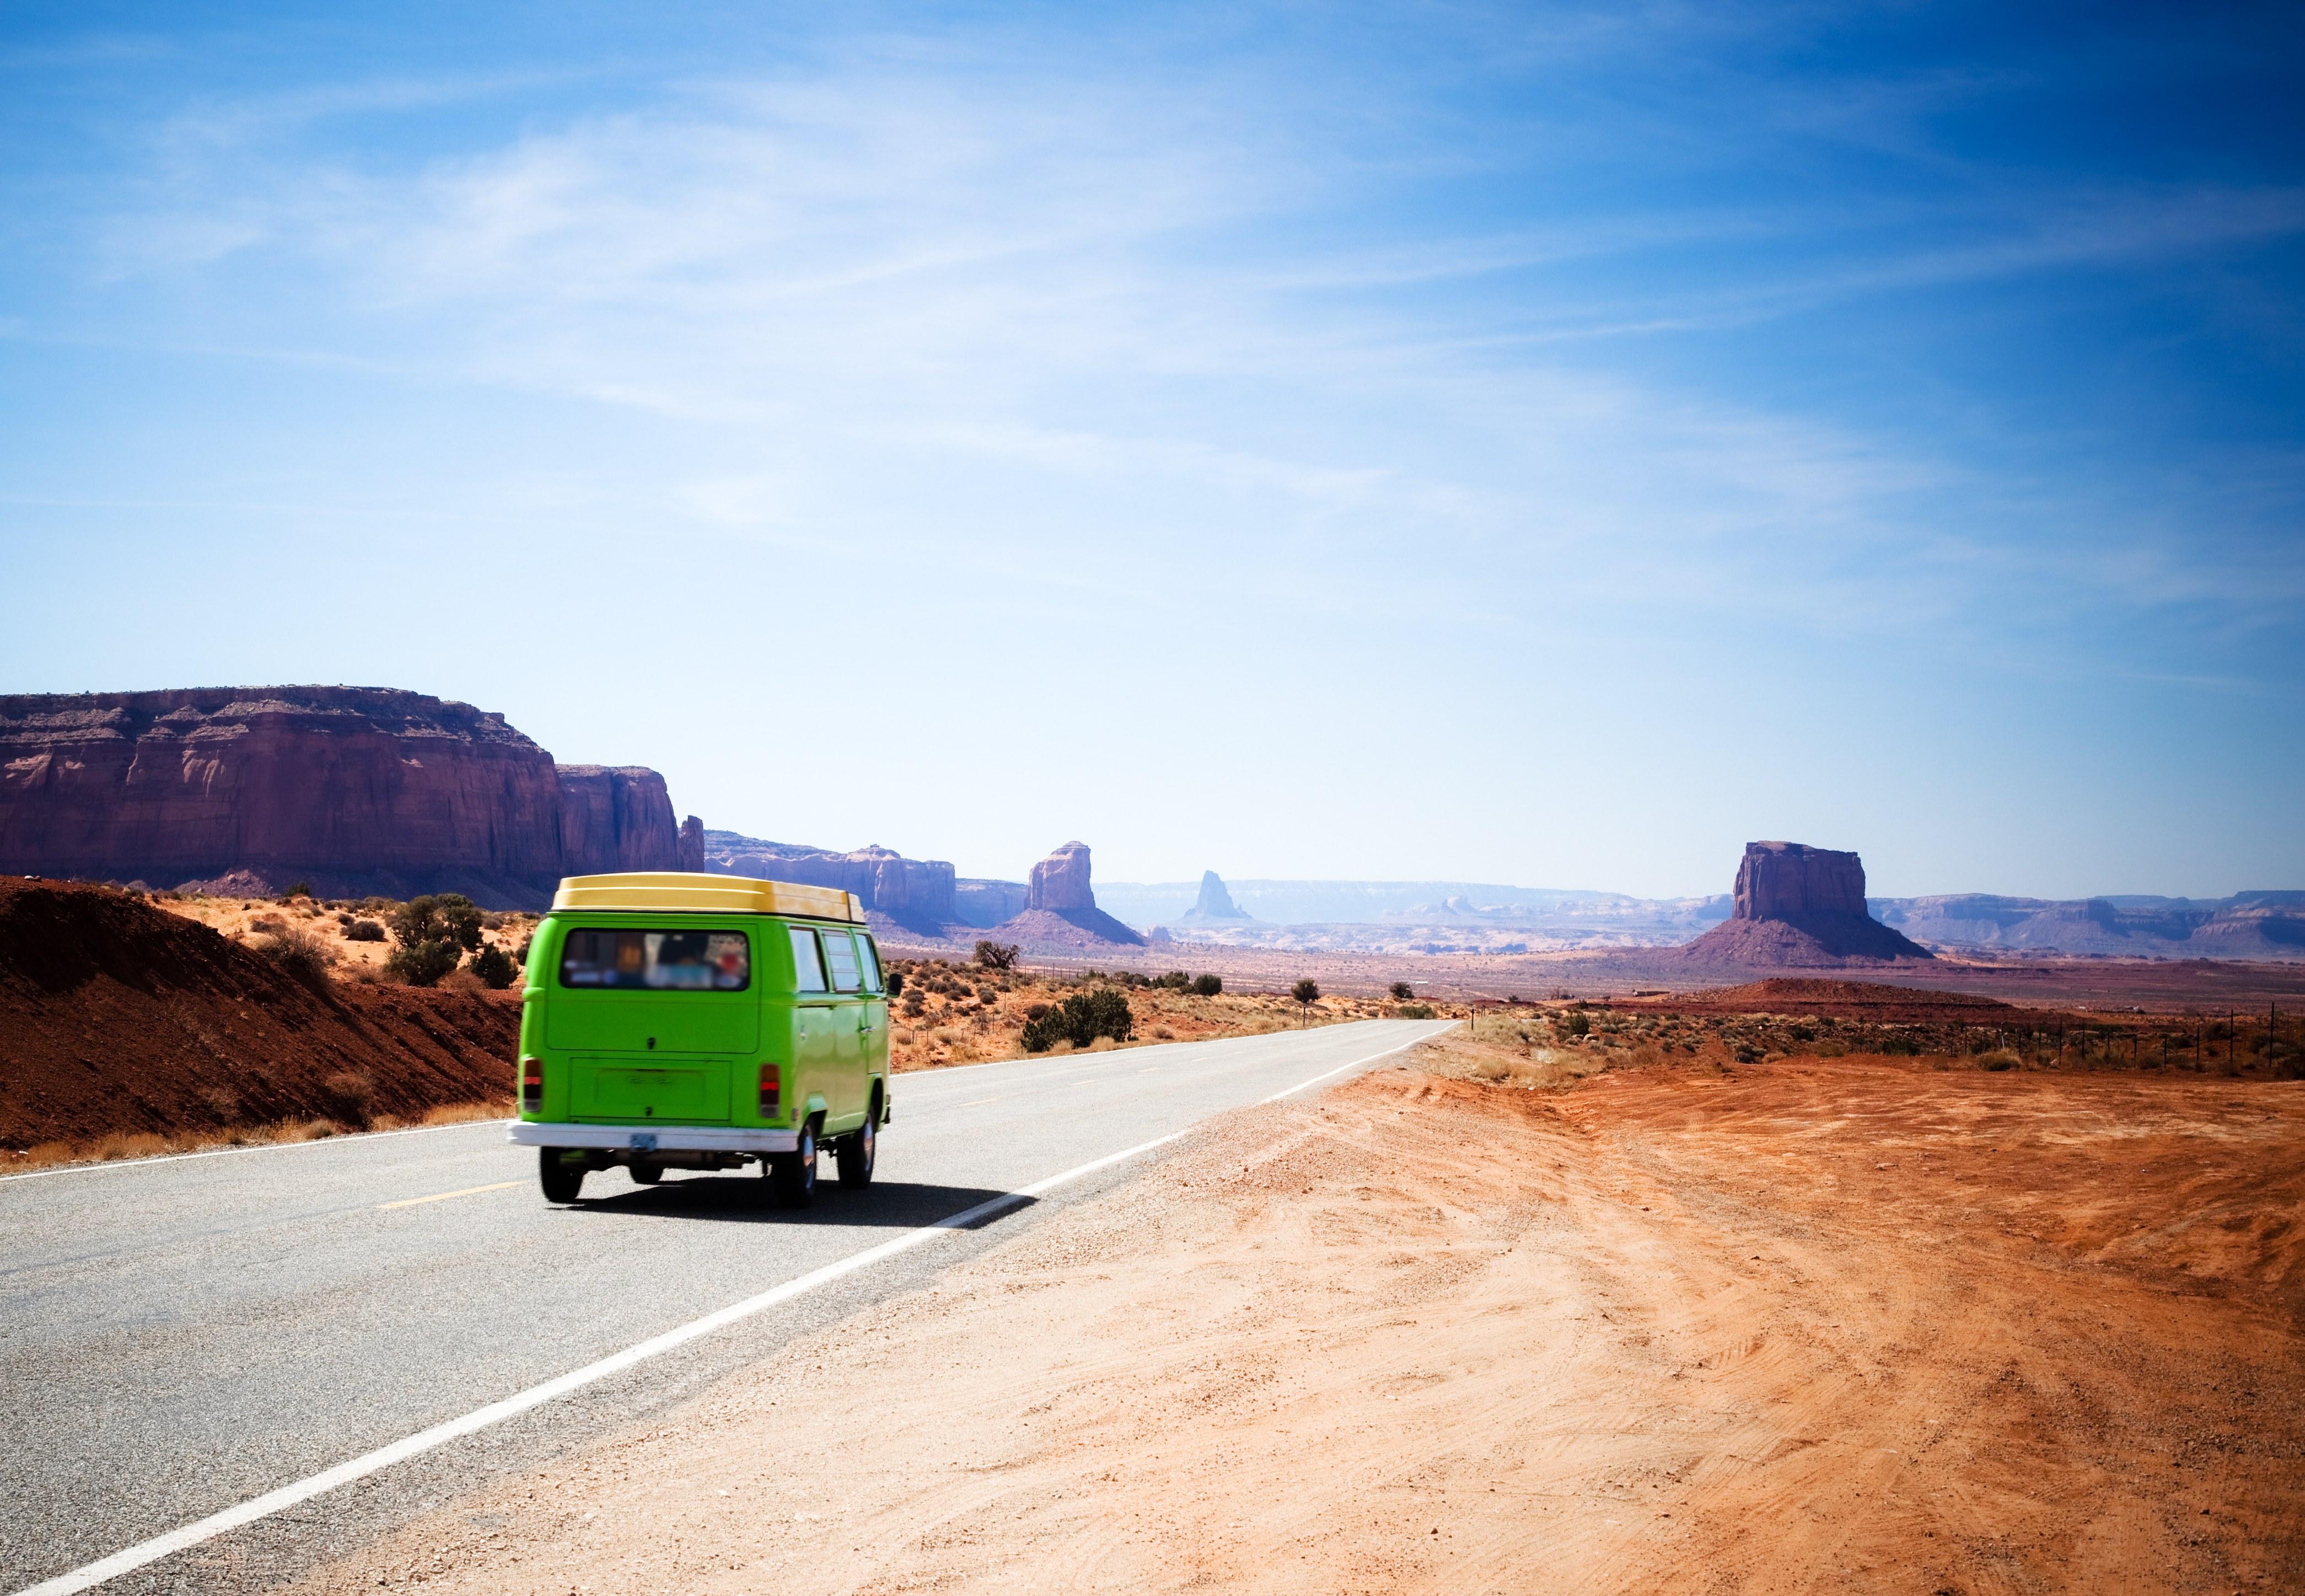 17 Summer Road Trip Songs We Love - Condé Nast Traveler